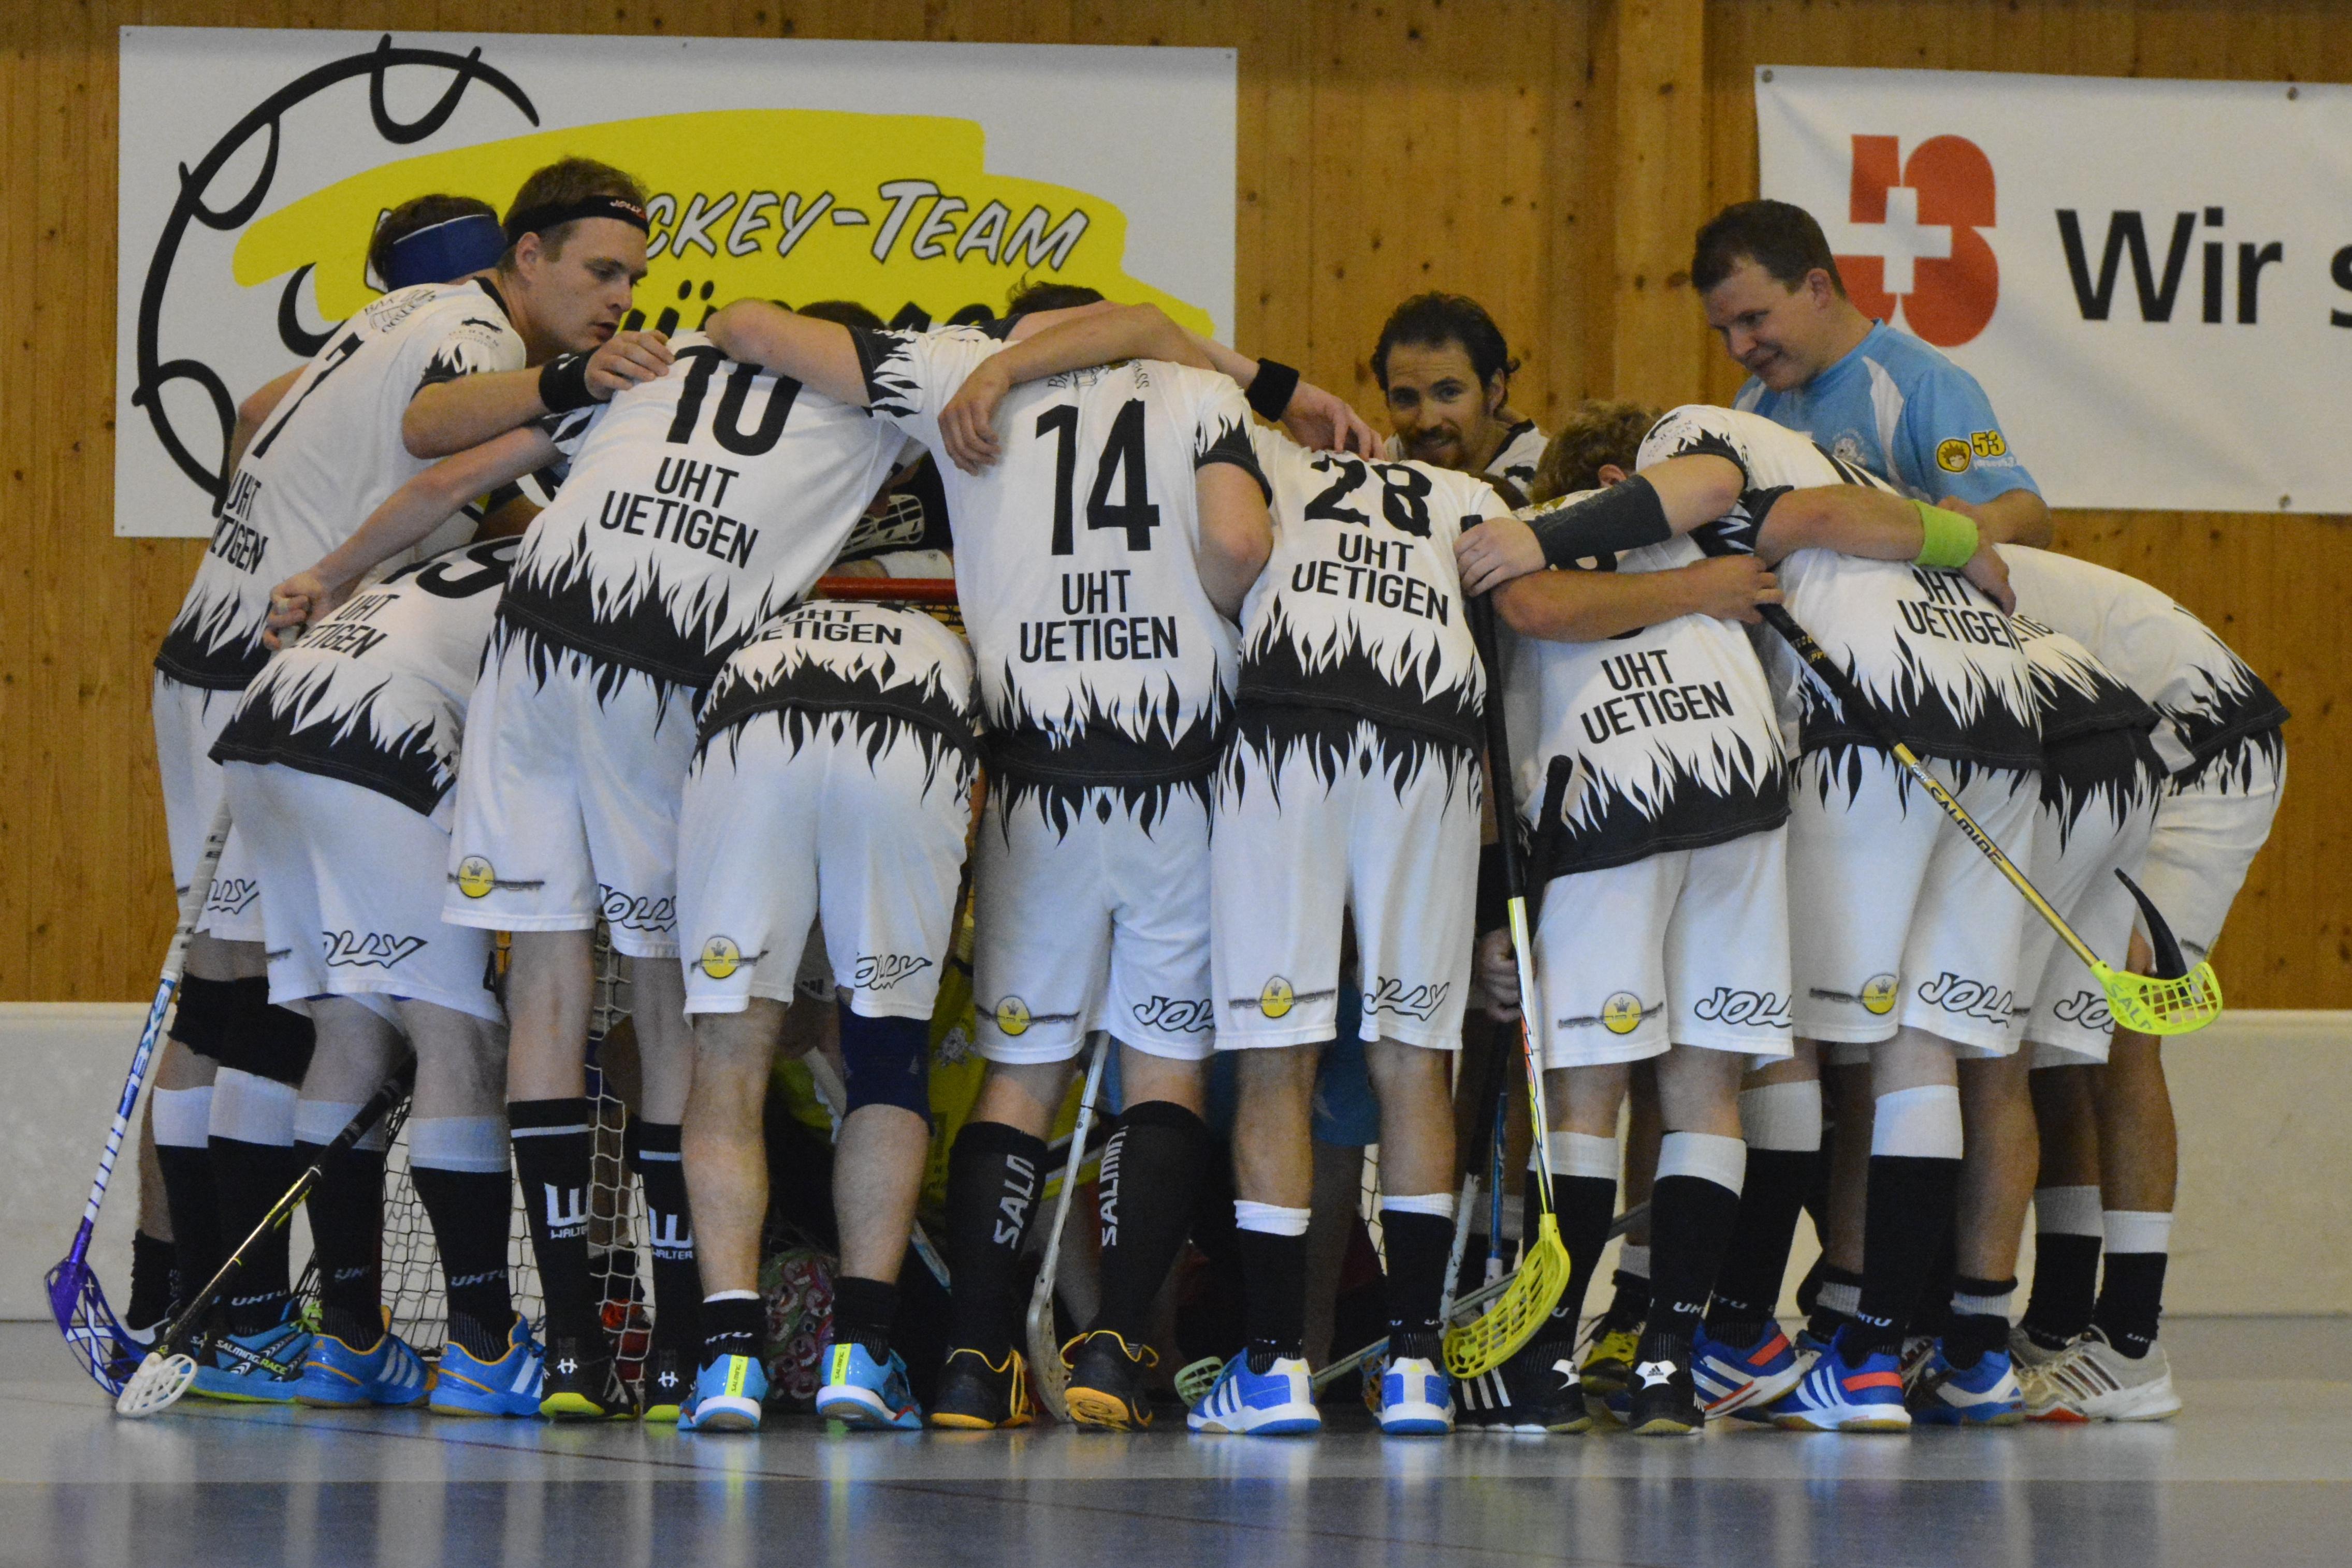 Herren Aktive GF 3.Liga - UHT Uetigen Saison 2014/15